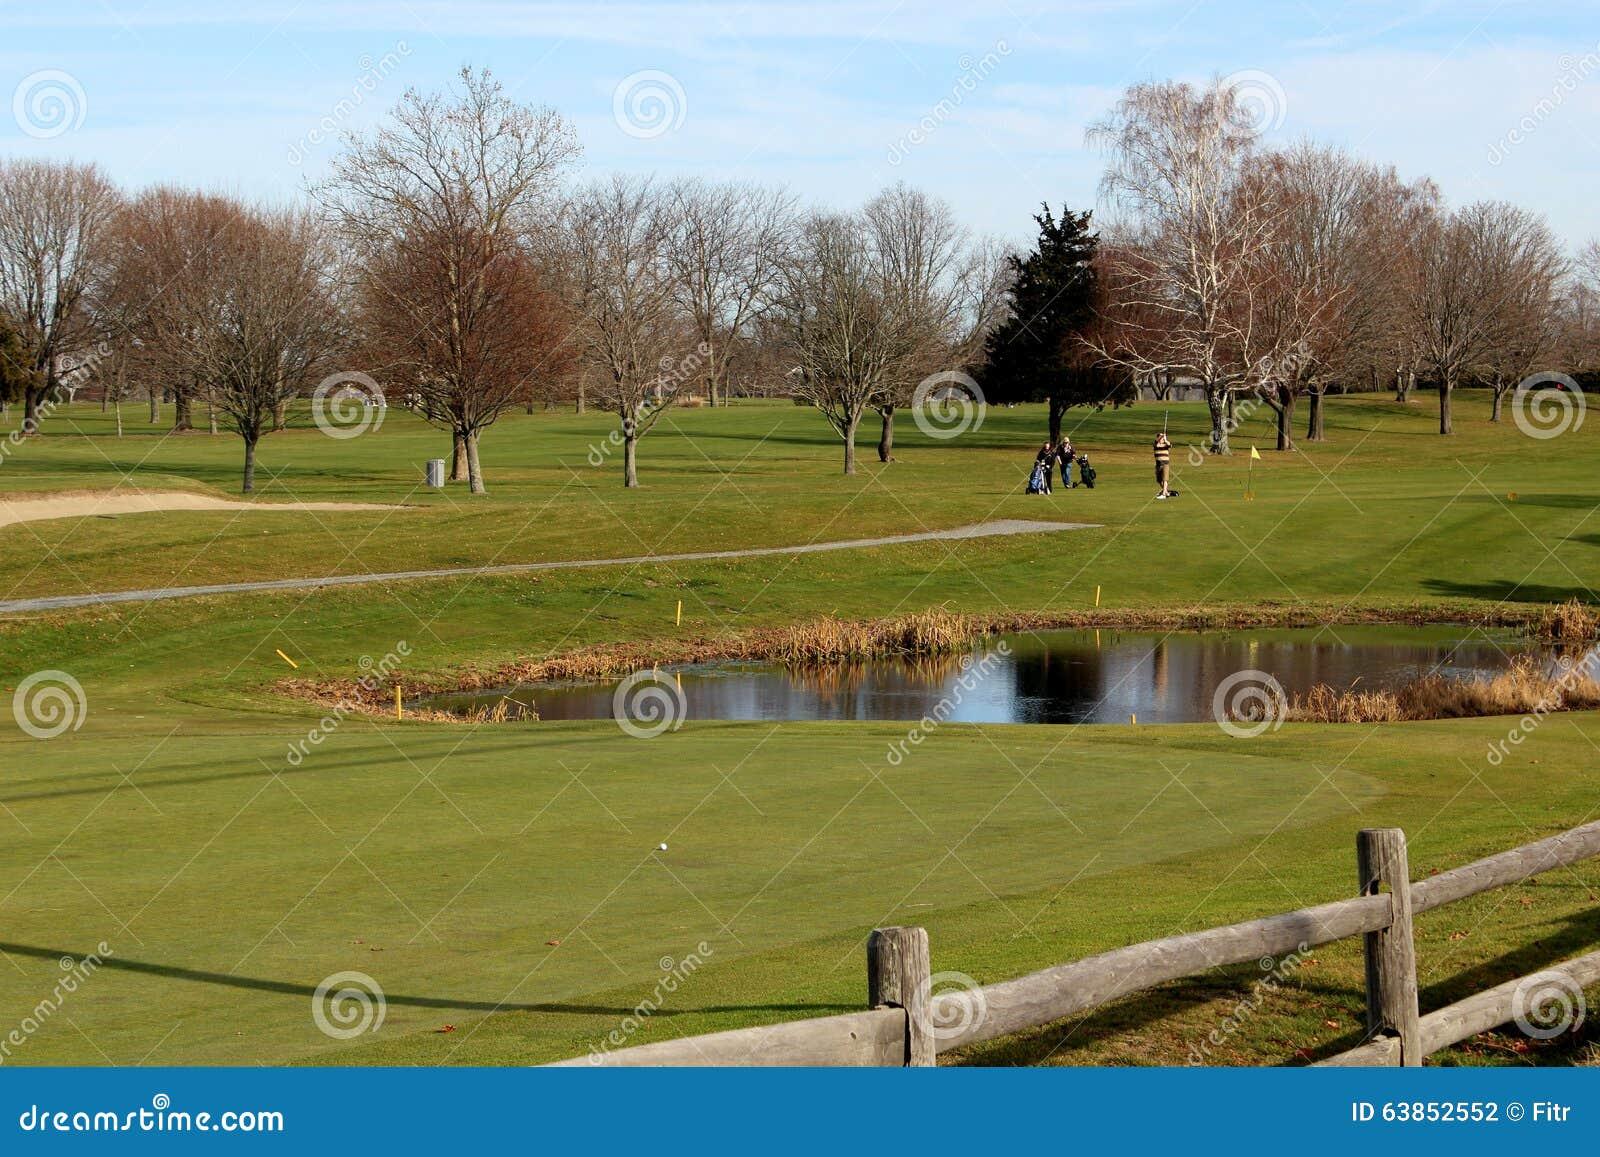 Golf course water hazard with golfers